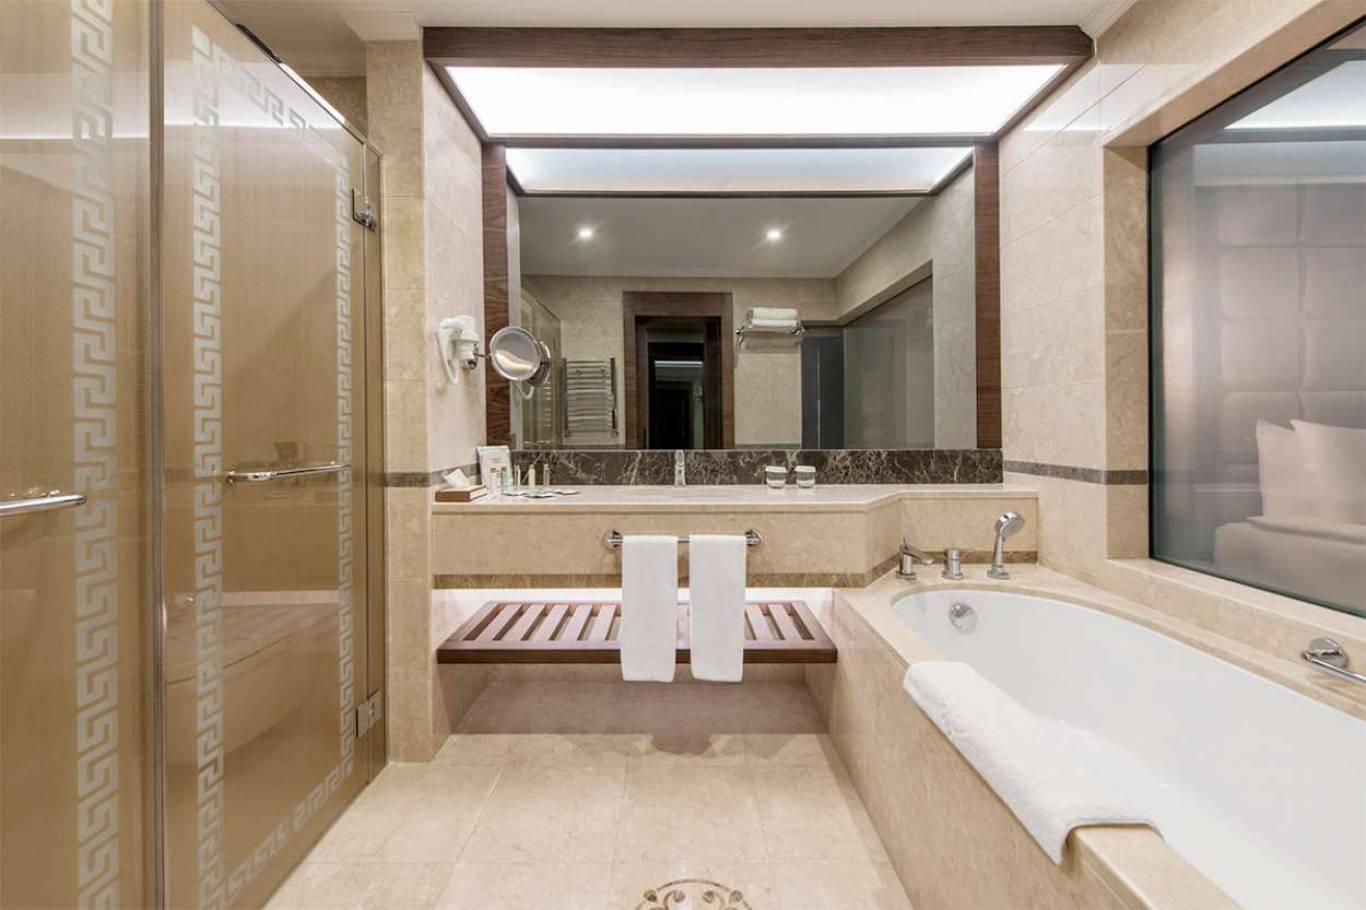 Akrones Termal Hotel - Comparer Les Prix Halalhotelcheck destiné Salon De Jardin Design Luxe